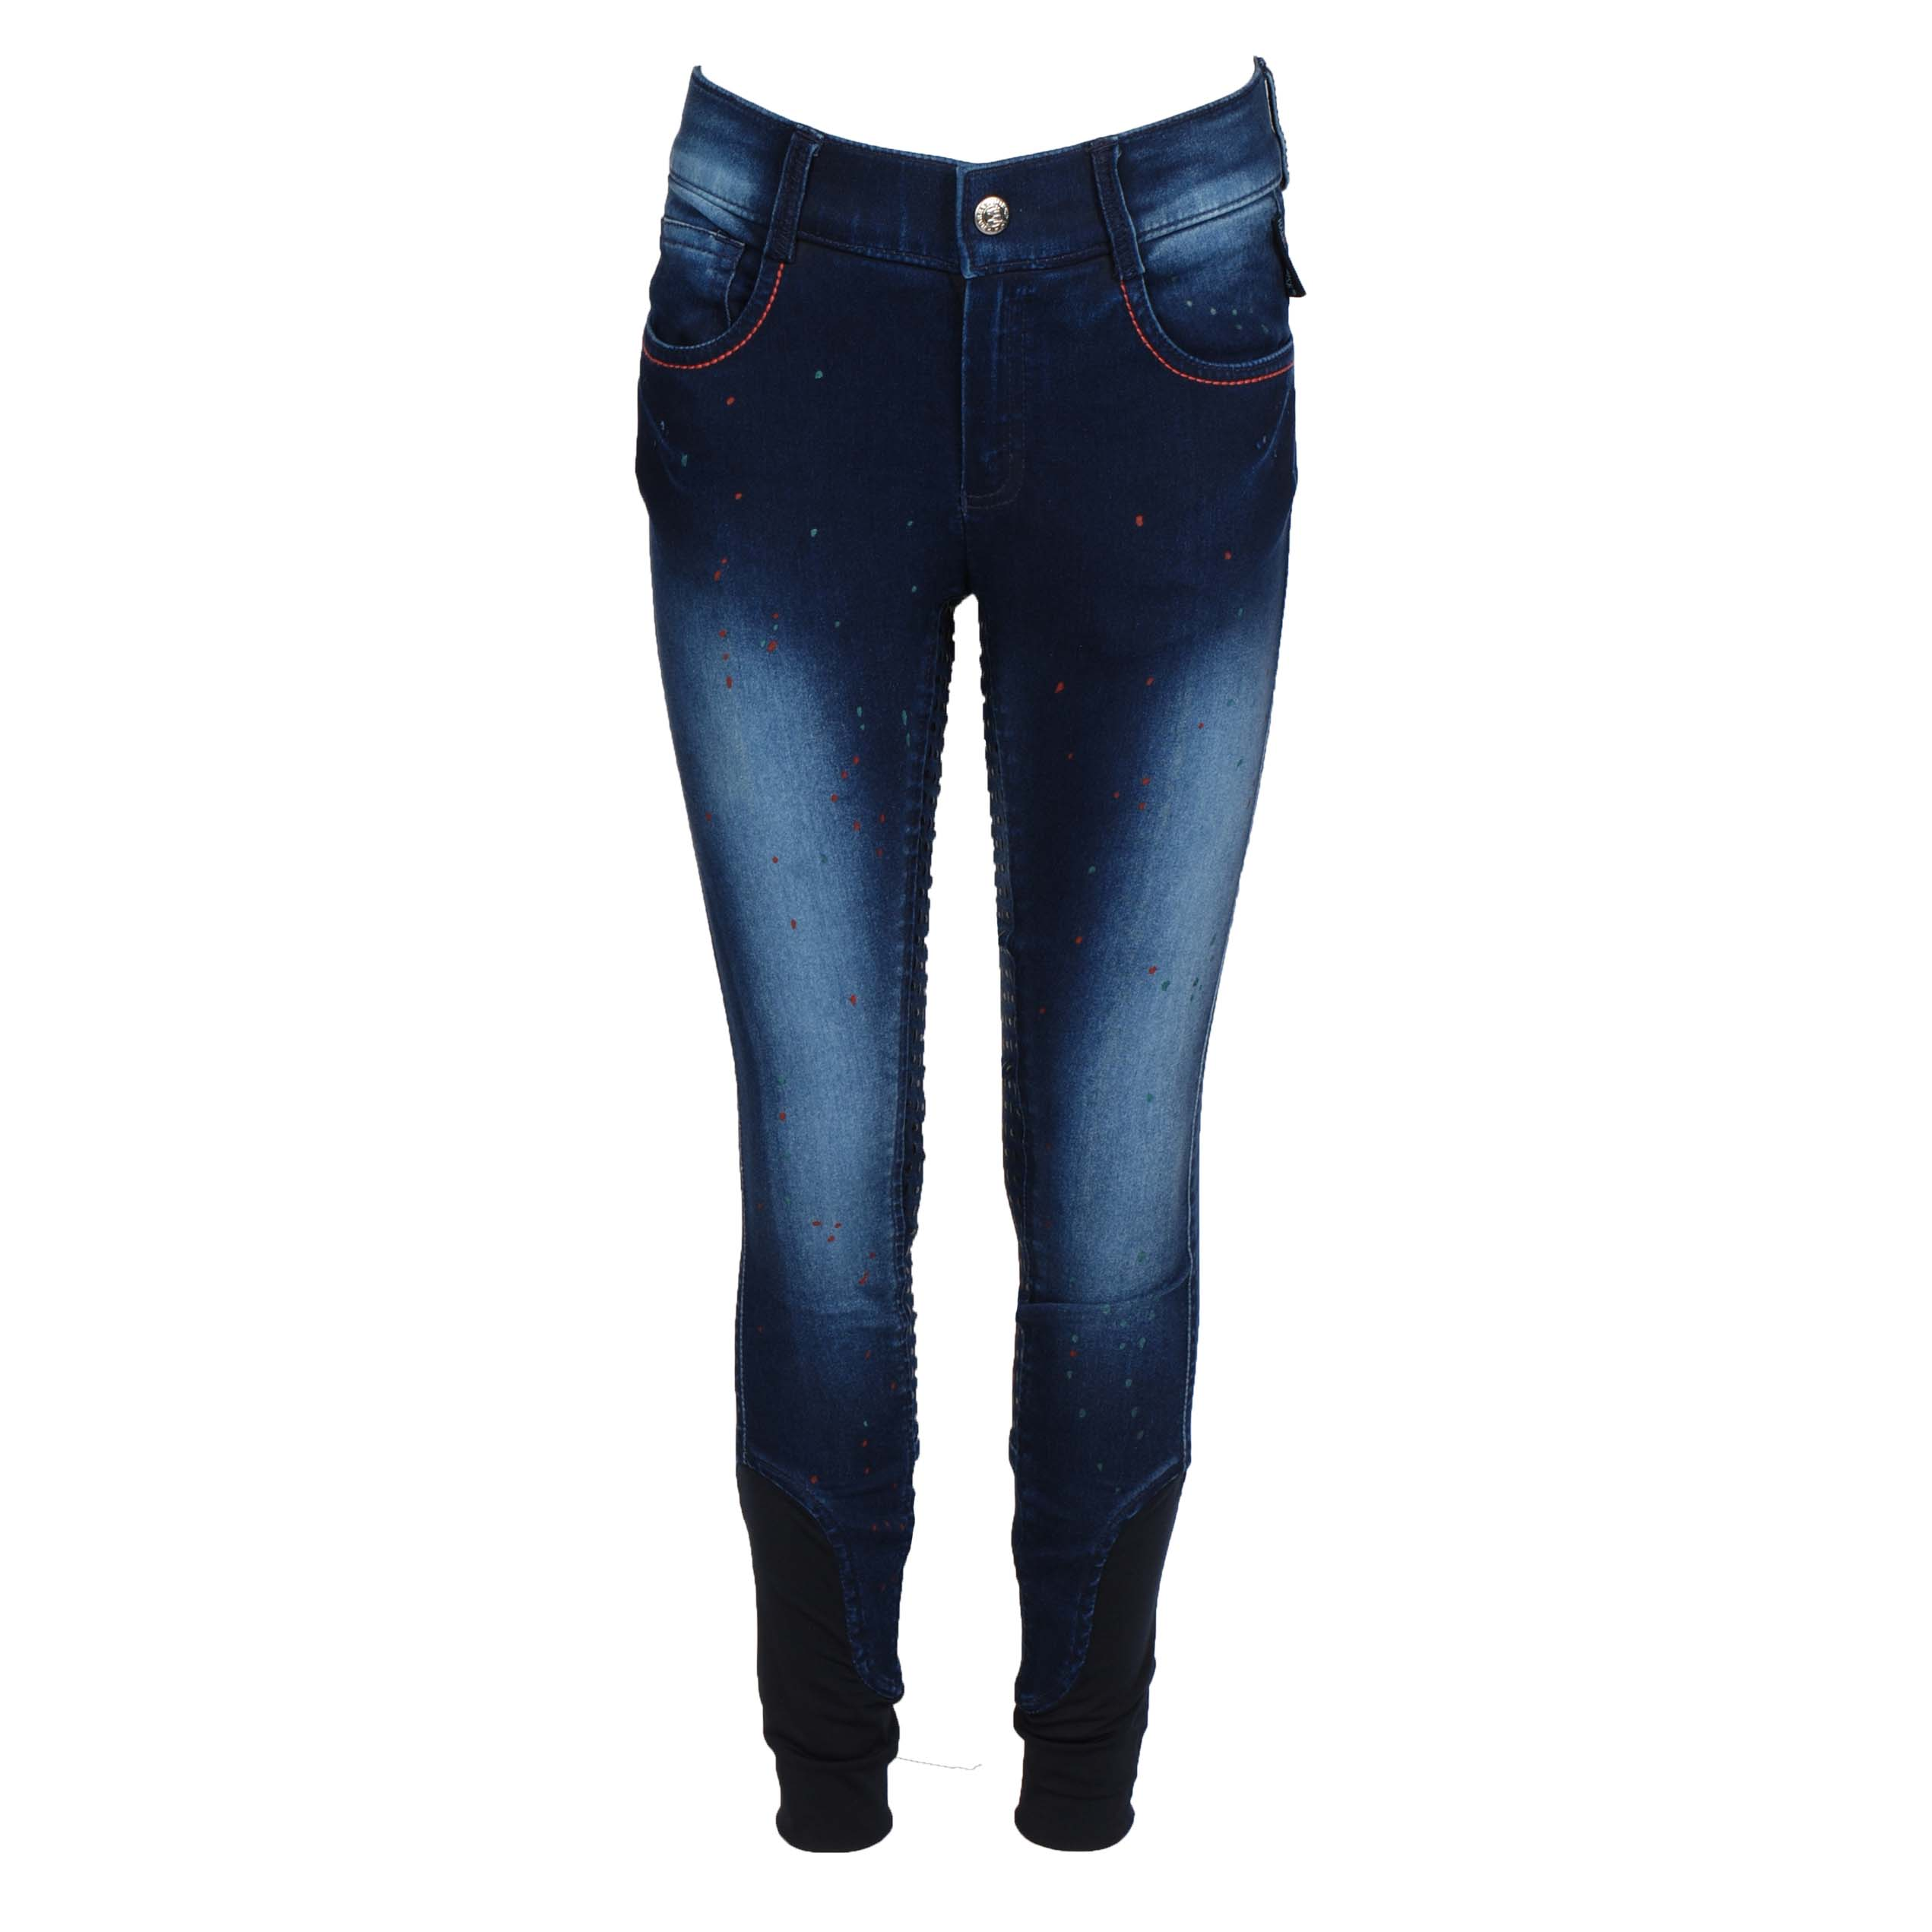 Harrys Horse Loulou Sanddrif FG kinder rijbroek jeans maat:128